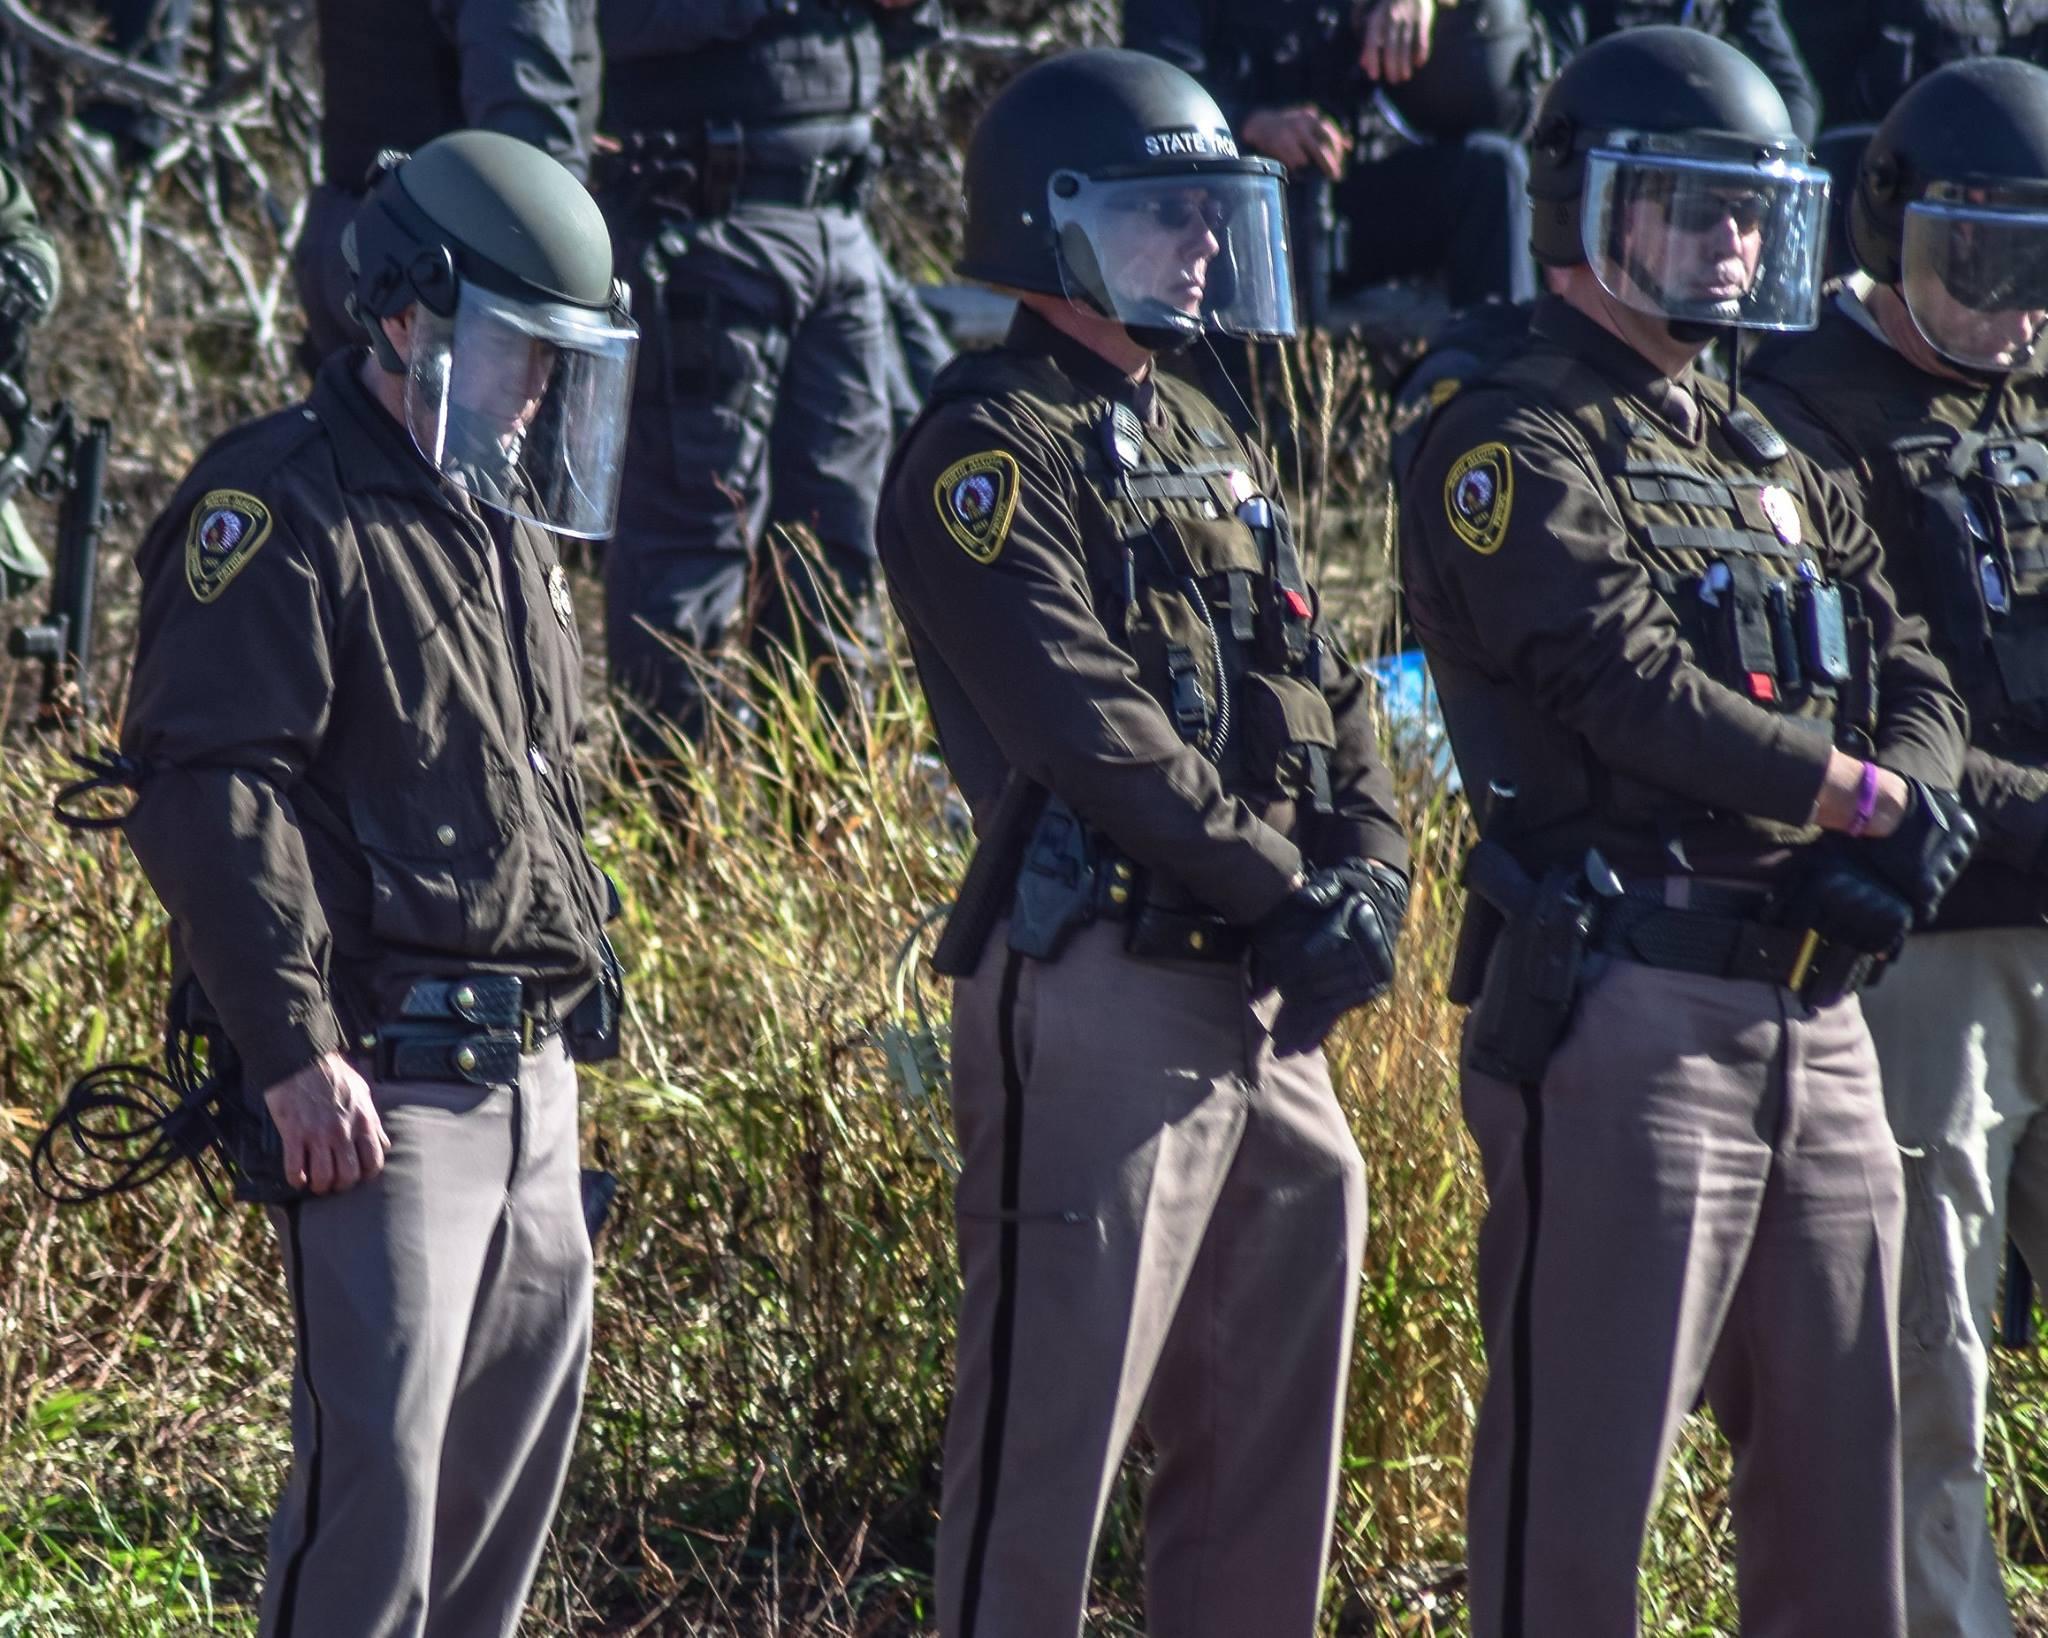 Despite Justice Dept. order, #NoDAPL pipeline standoff continues